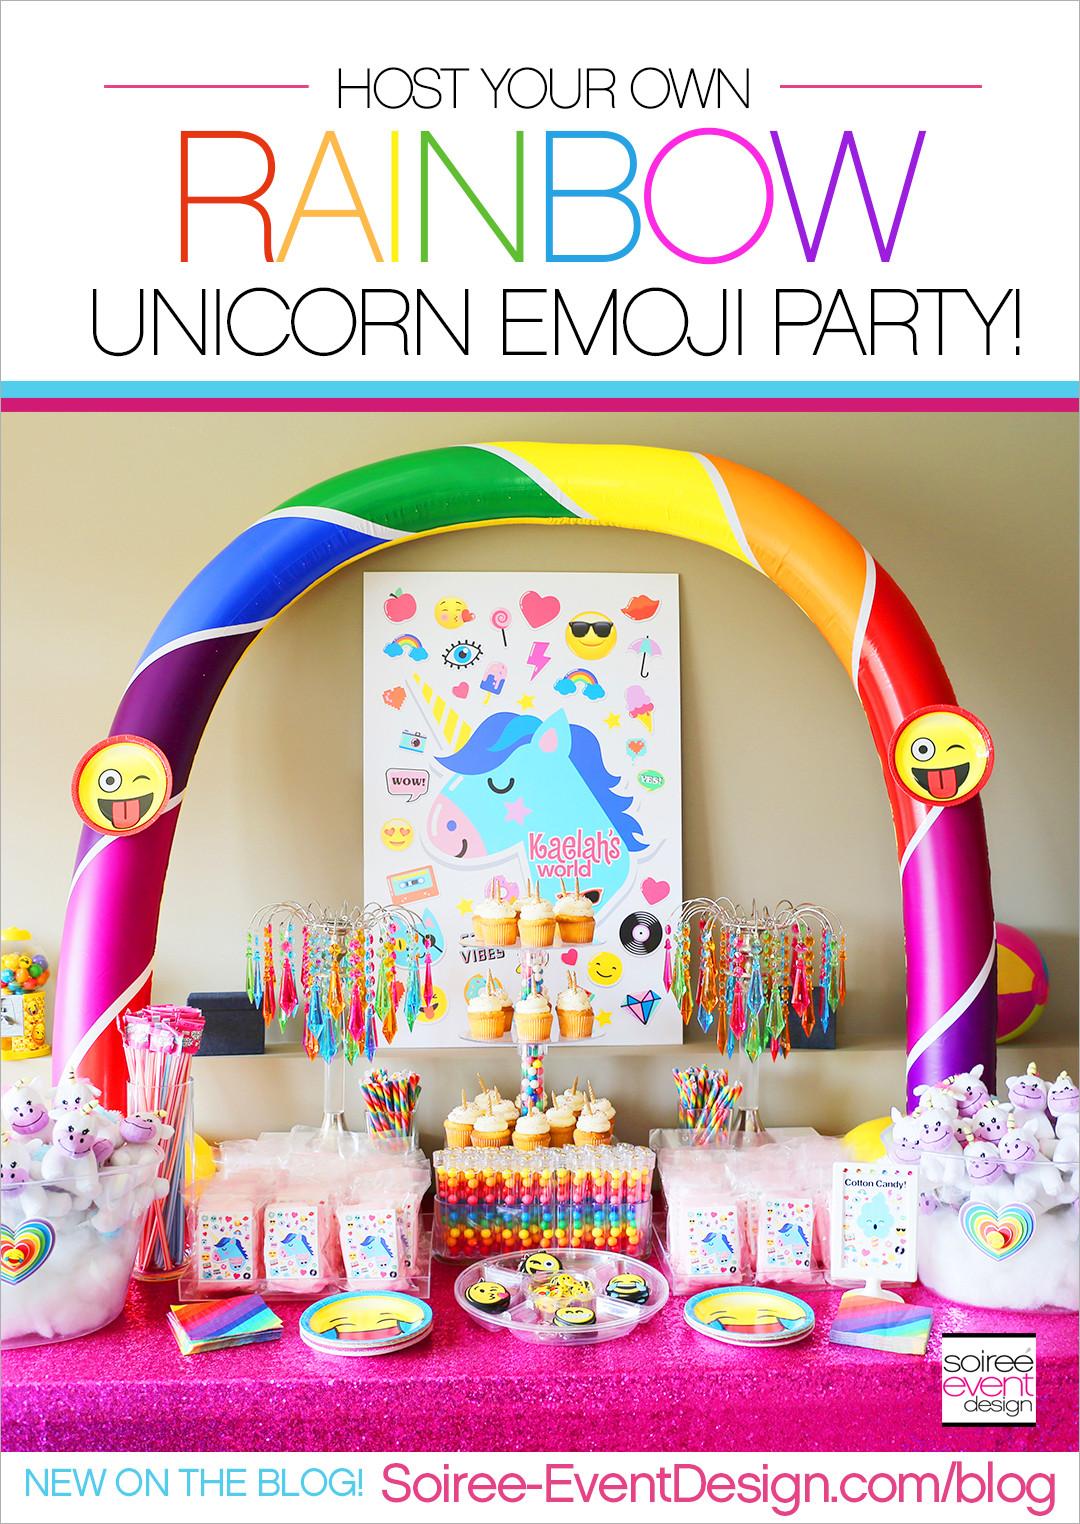 Unicorn And Rainbow Party Ideas  Rainbow Unicorn Emoji Party Ideas Soiree Event Design